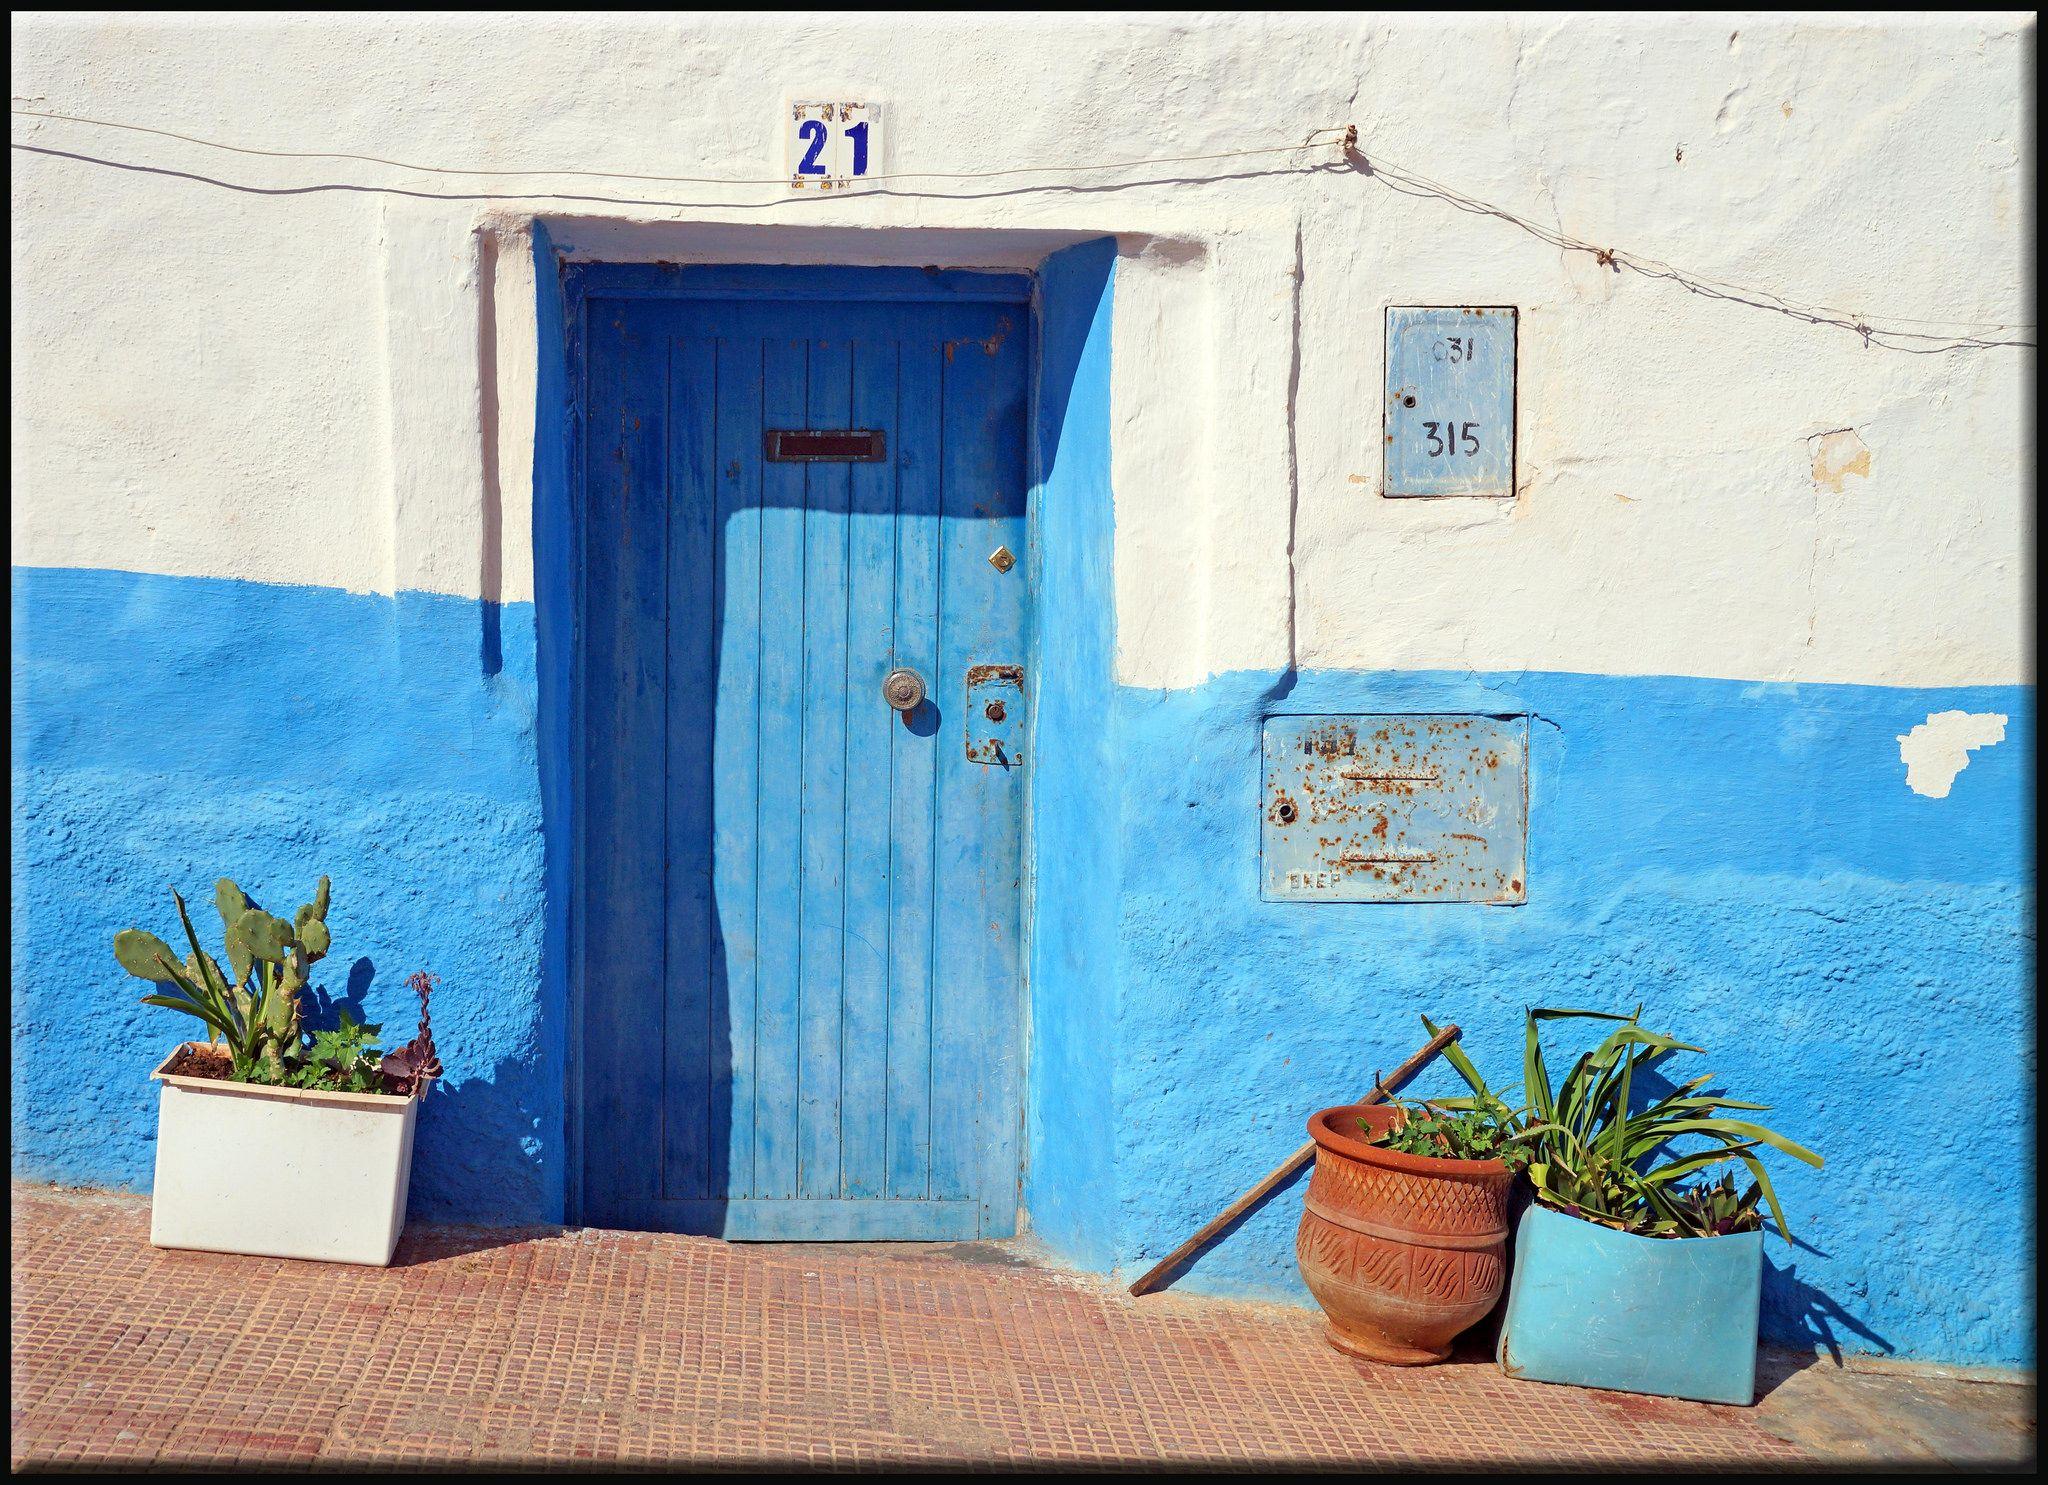 a Sidi Ifni door in blue. Ifni, Souss-Massa-Draa, Morocco | Explore mhobl's photos on Flickr.… | Flickr - Photo Sharing!